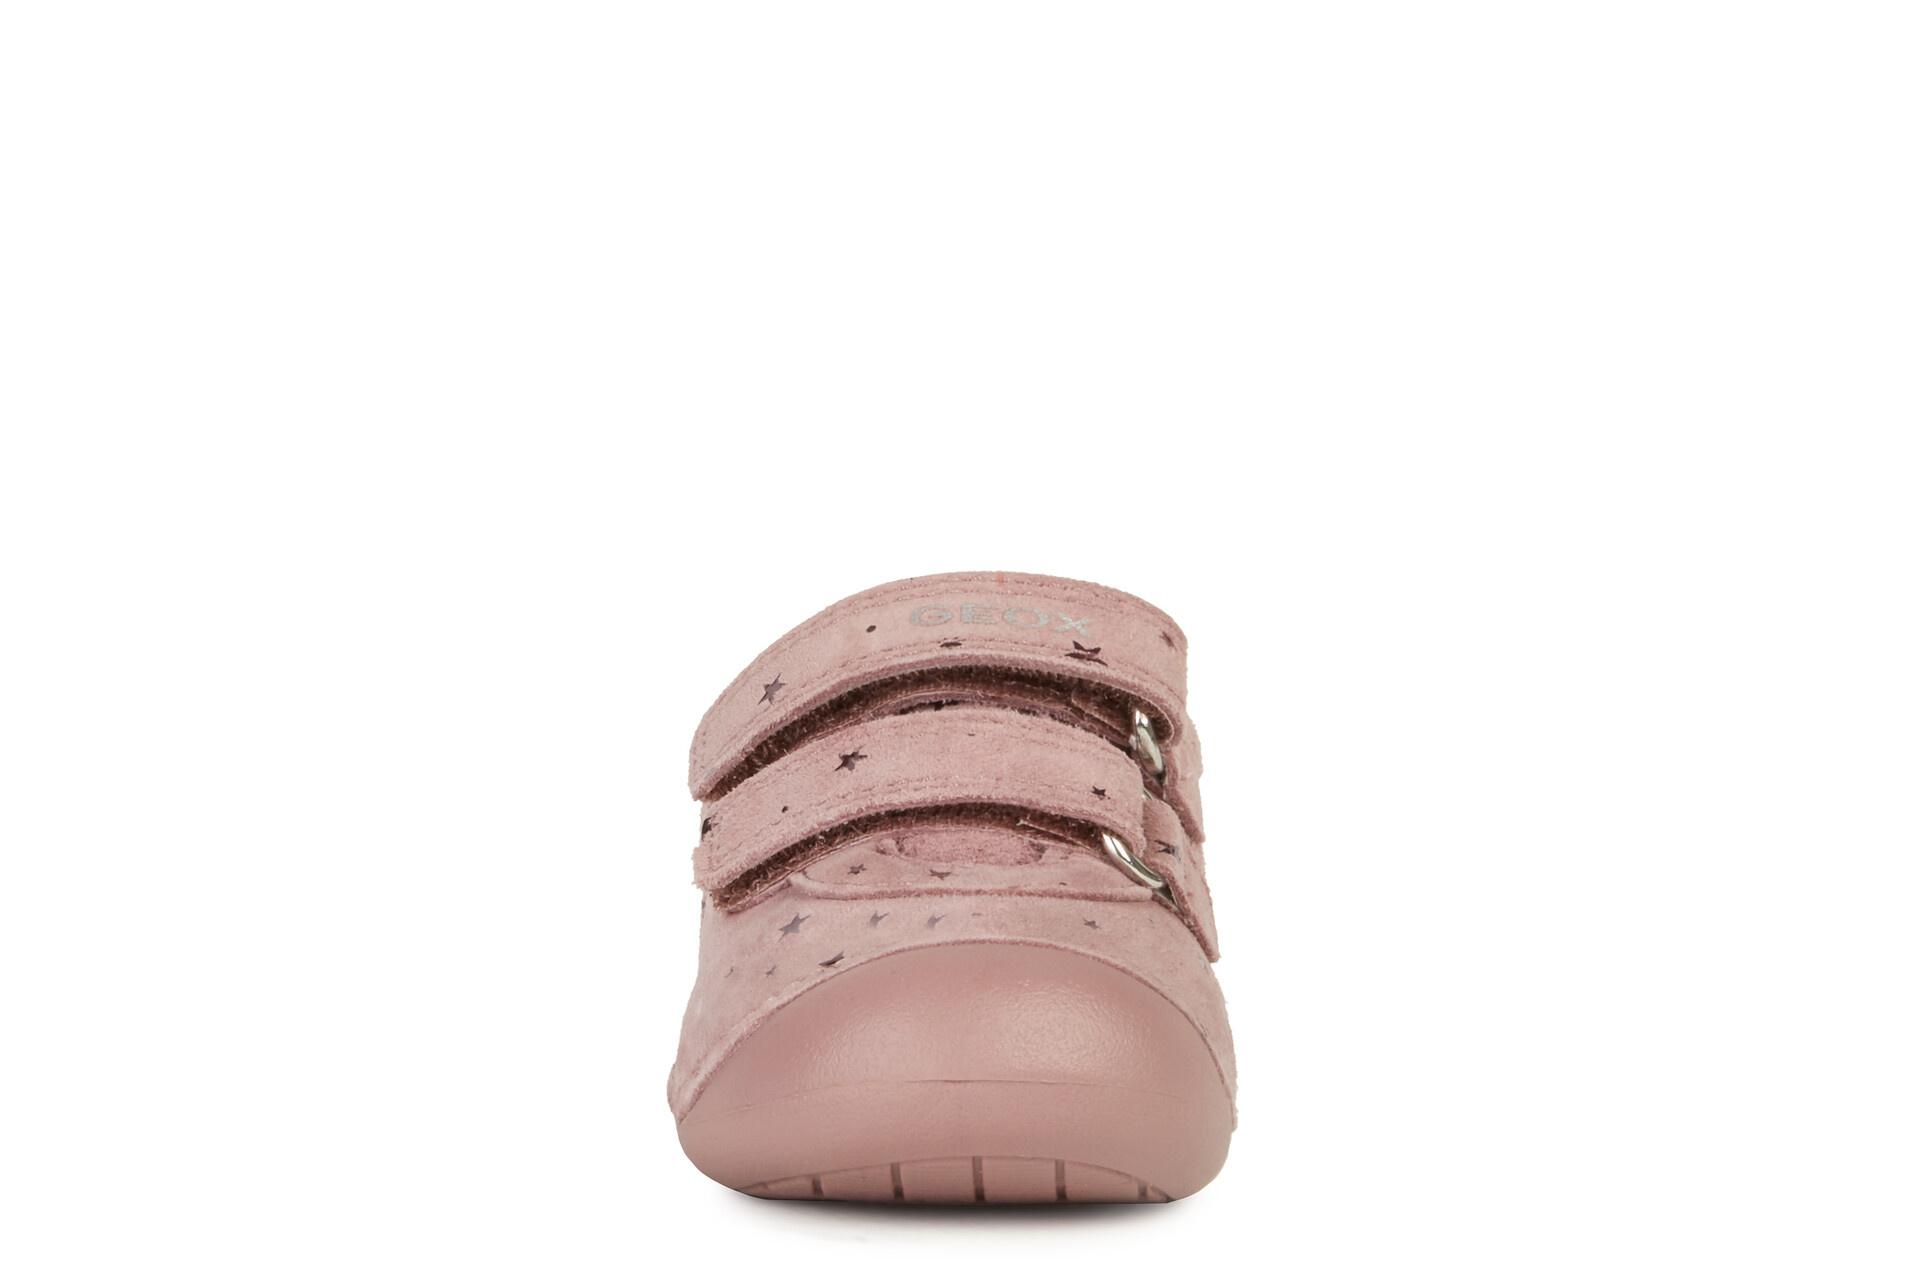 Geox Tutim DK Pink